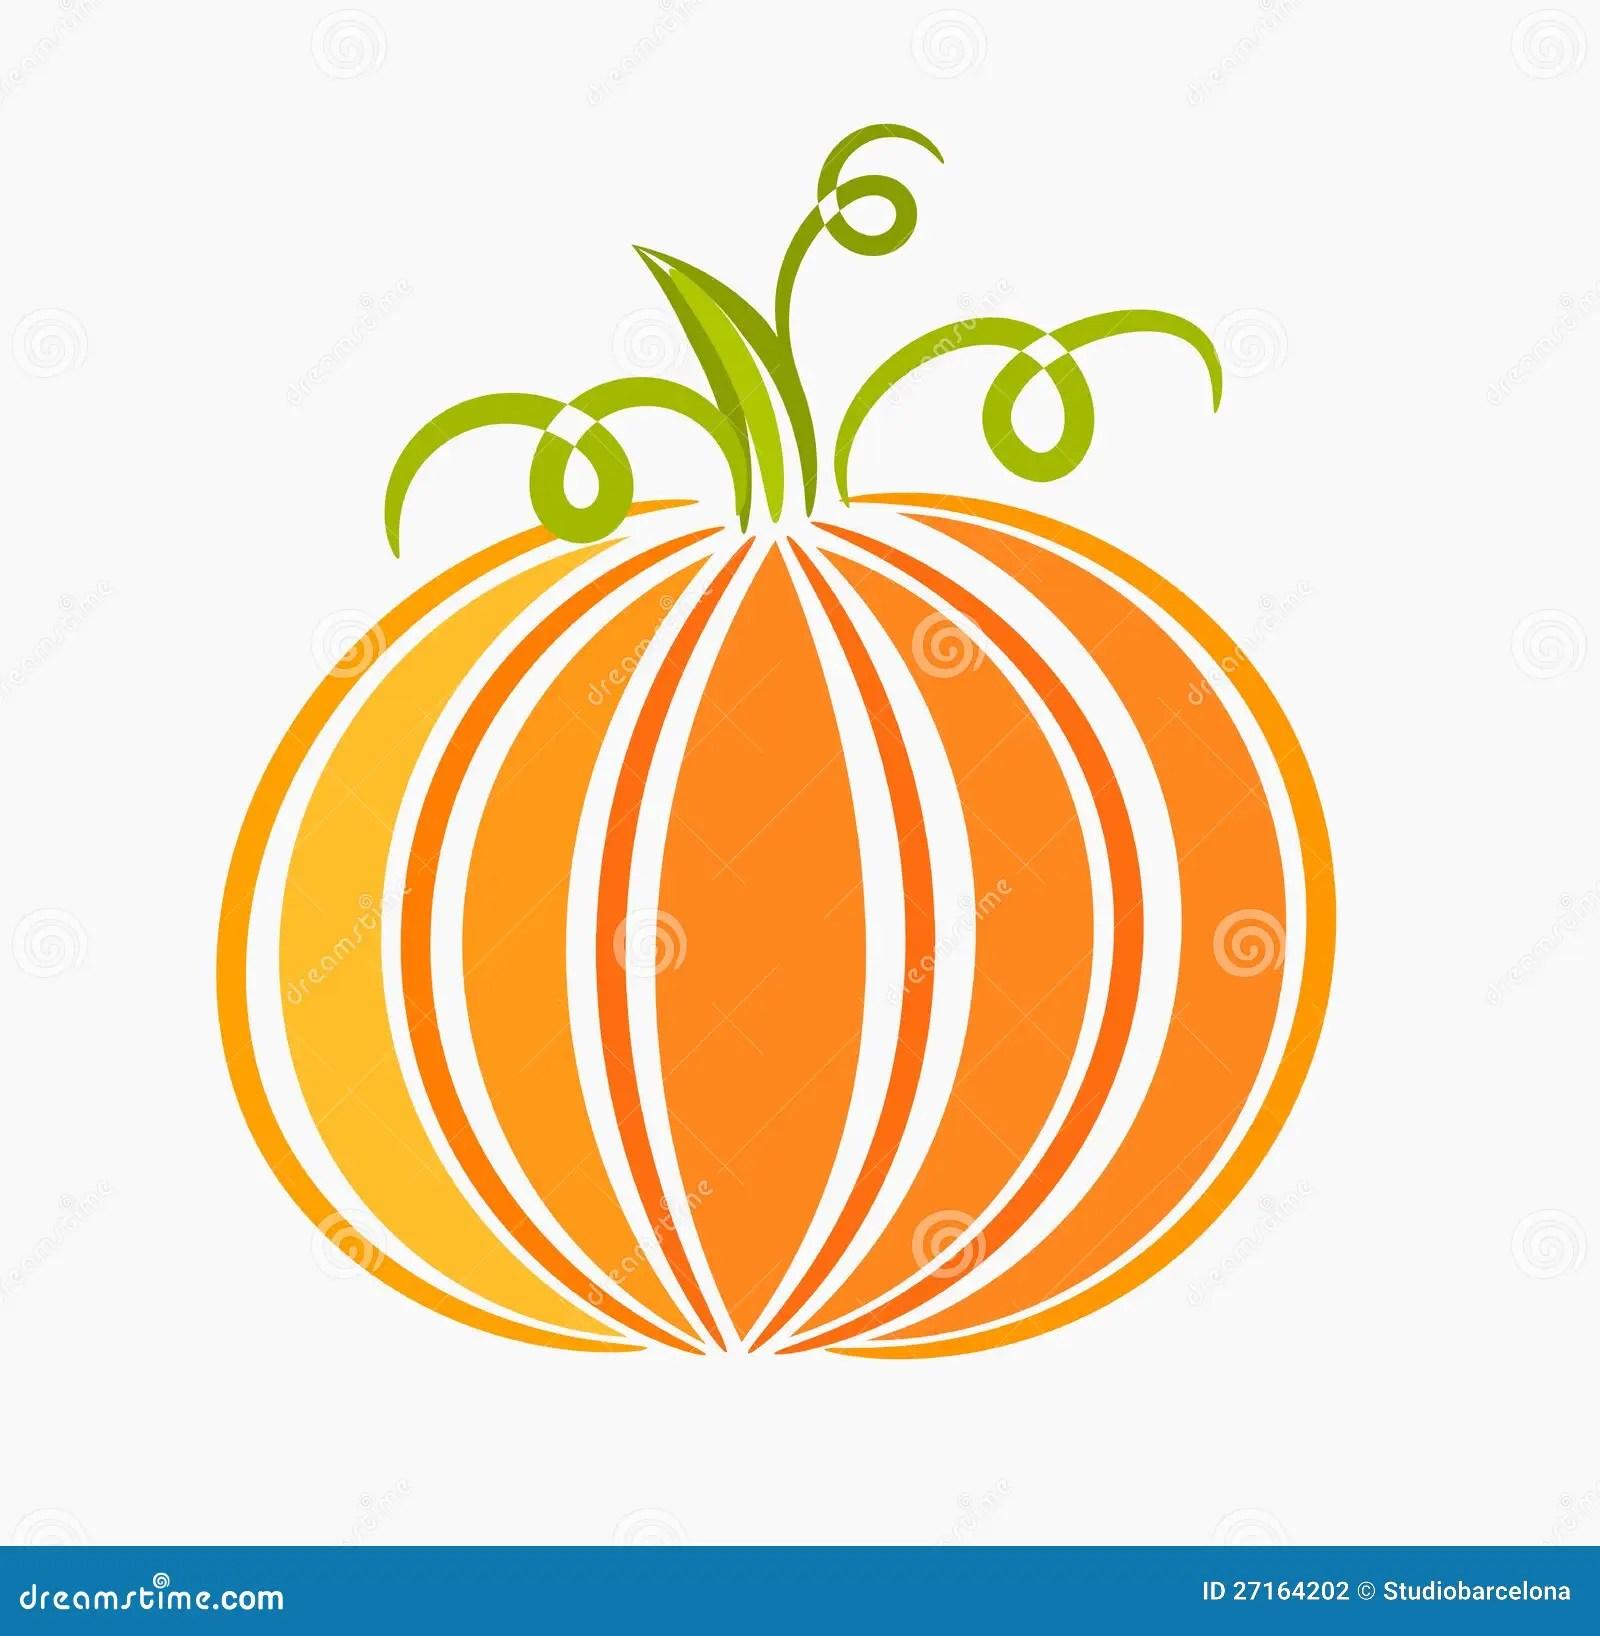 Pumpkin Illustration Stock Photography